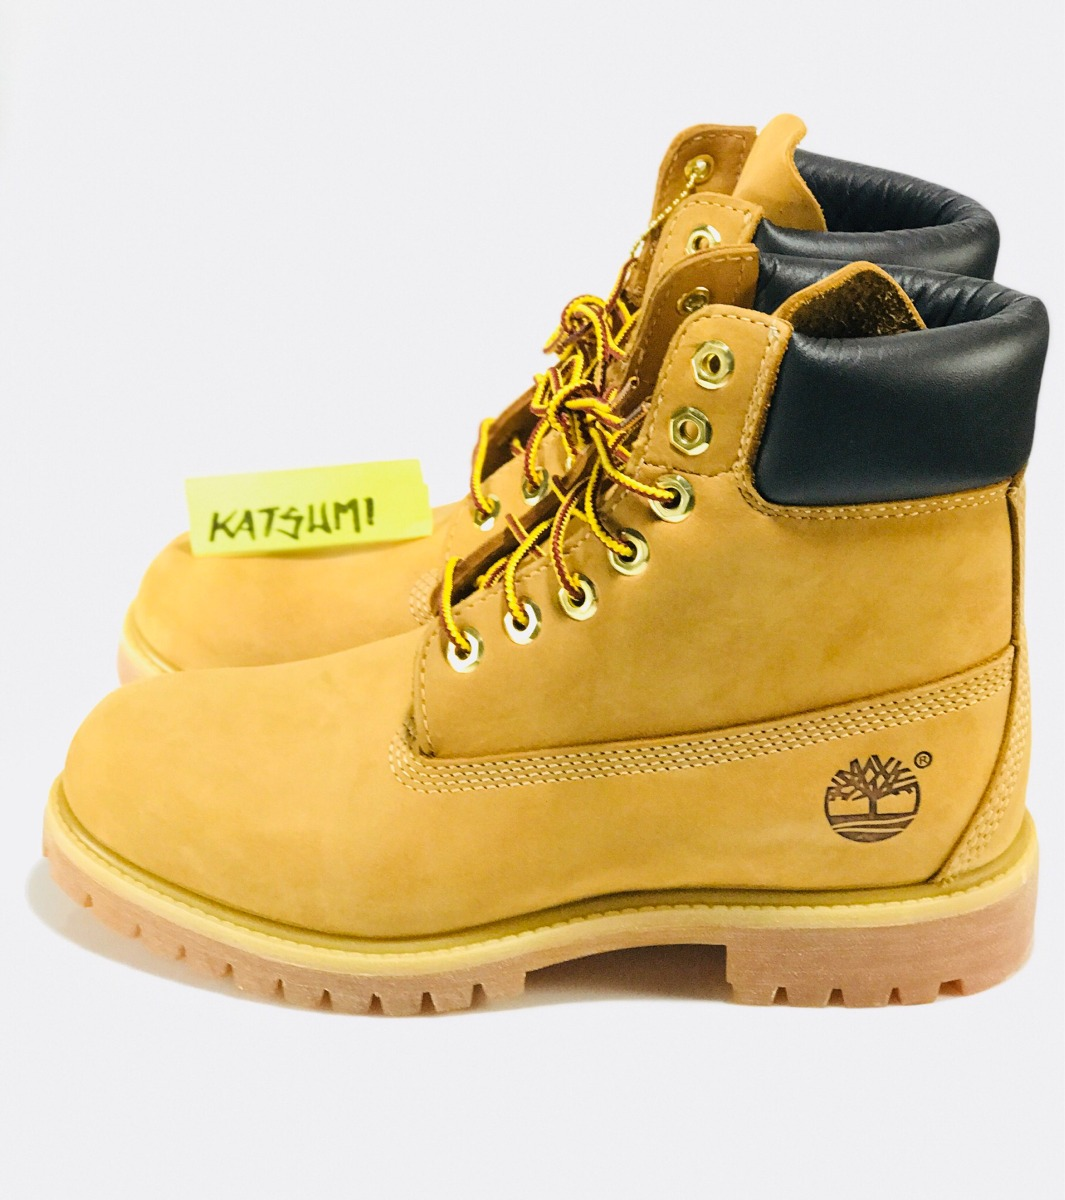 new york sale online large discount Bota Timberland Yellow Boot 38 7.0 Nova Original Sem Juros